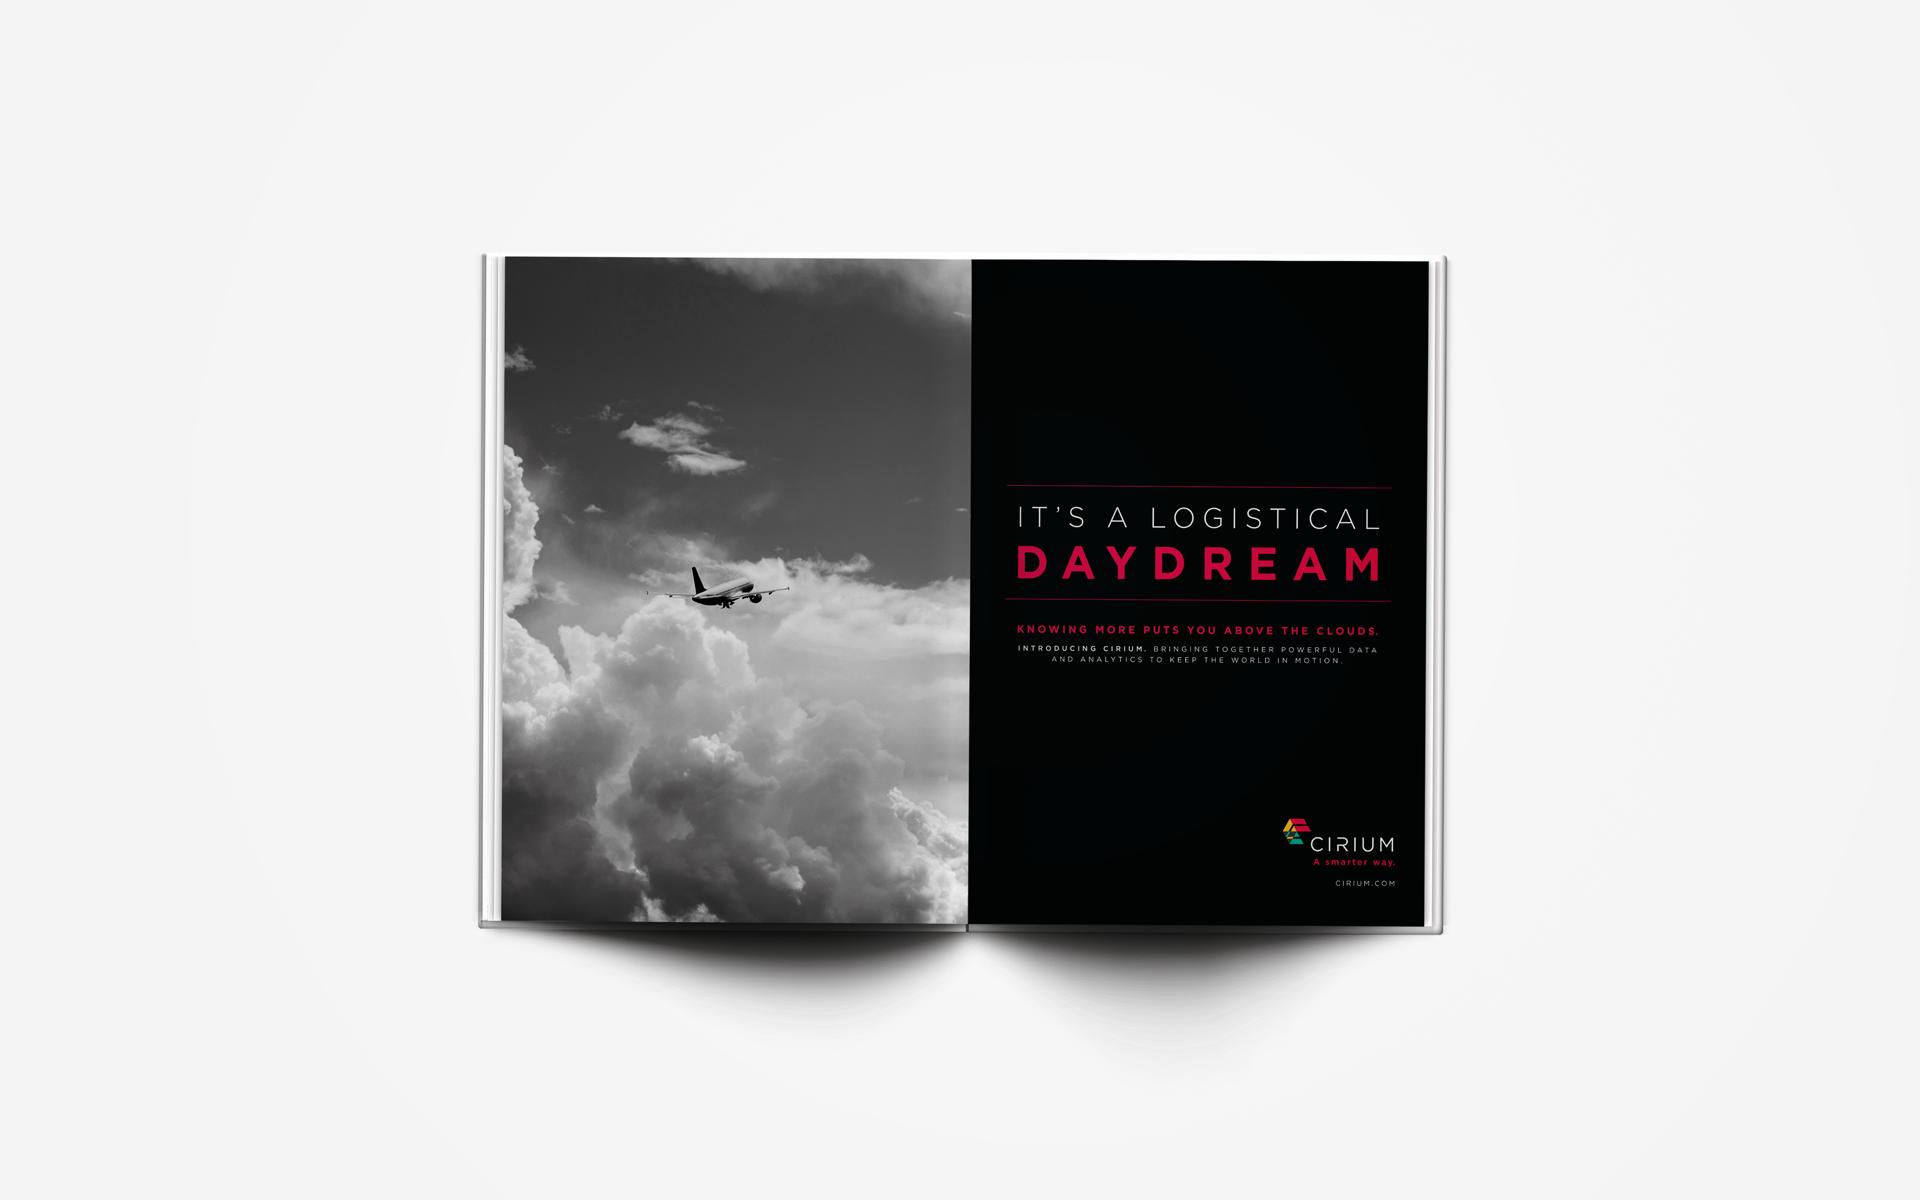 spread-daydream.png